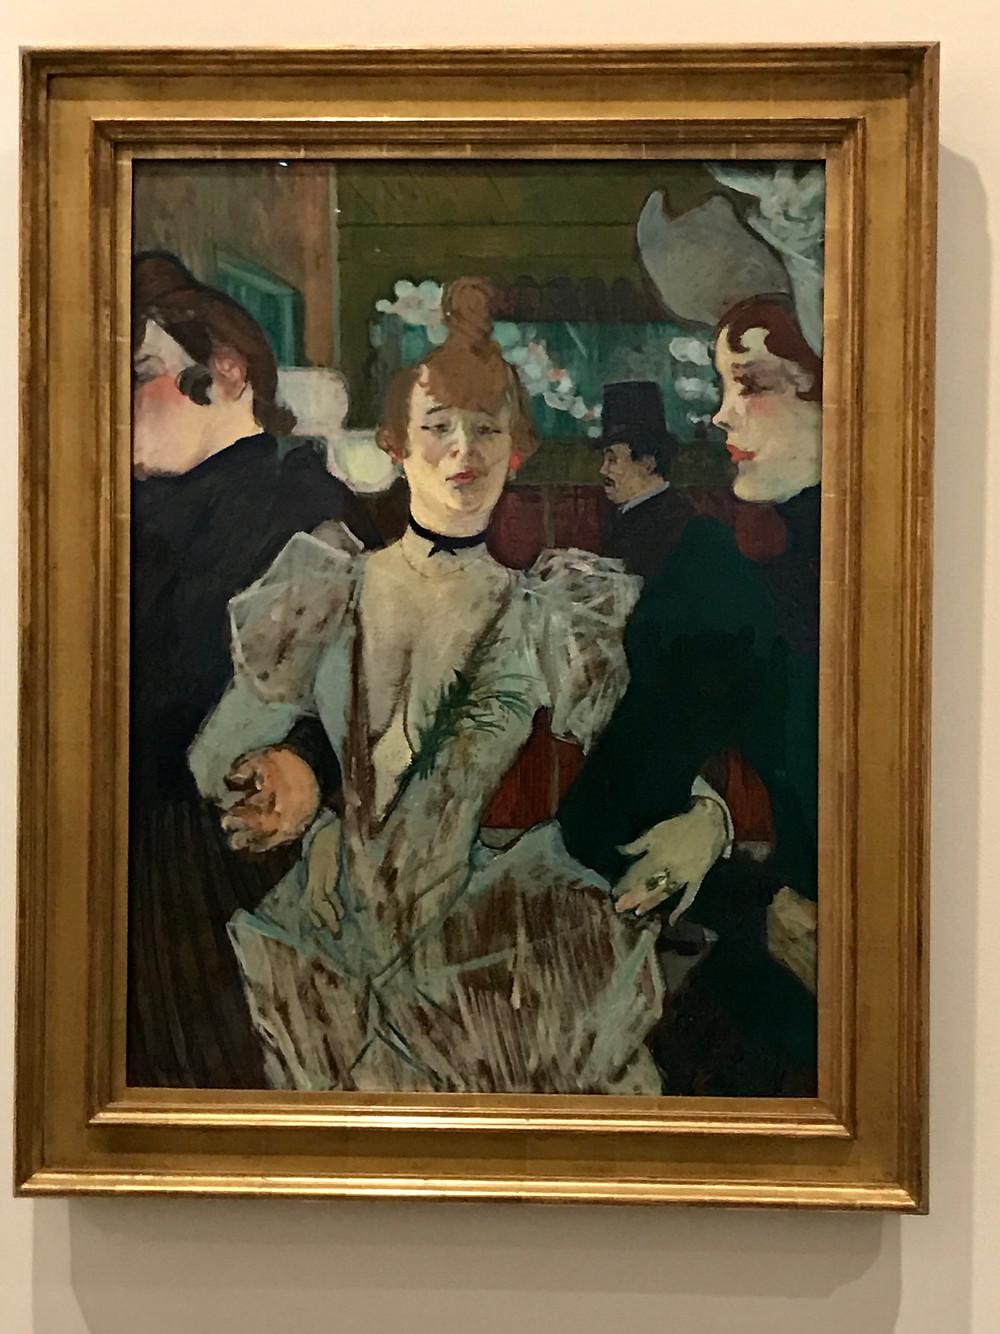 "Постер"" the Moulin Rouge"""